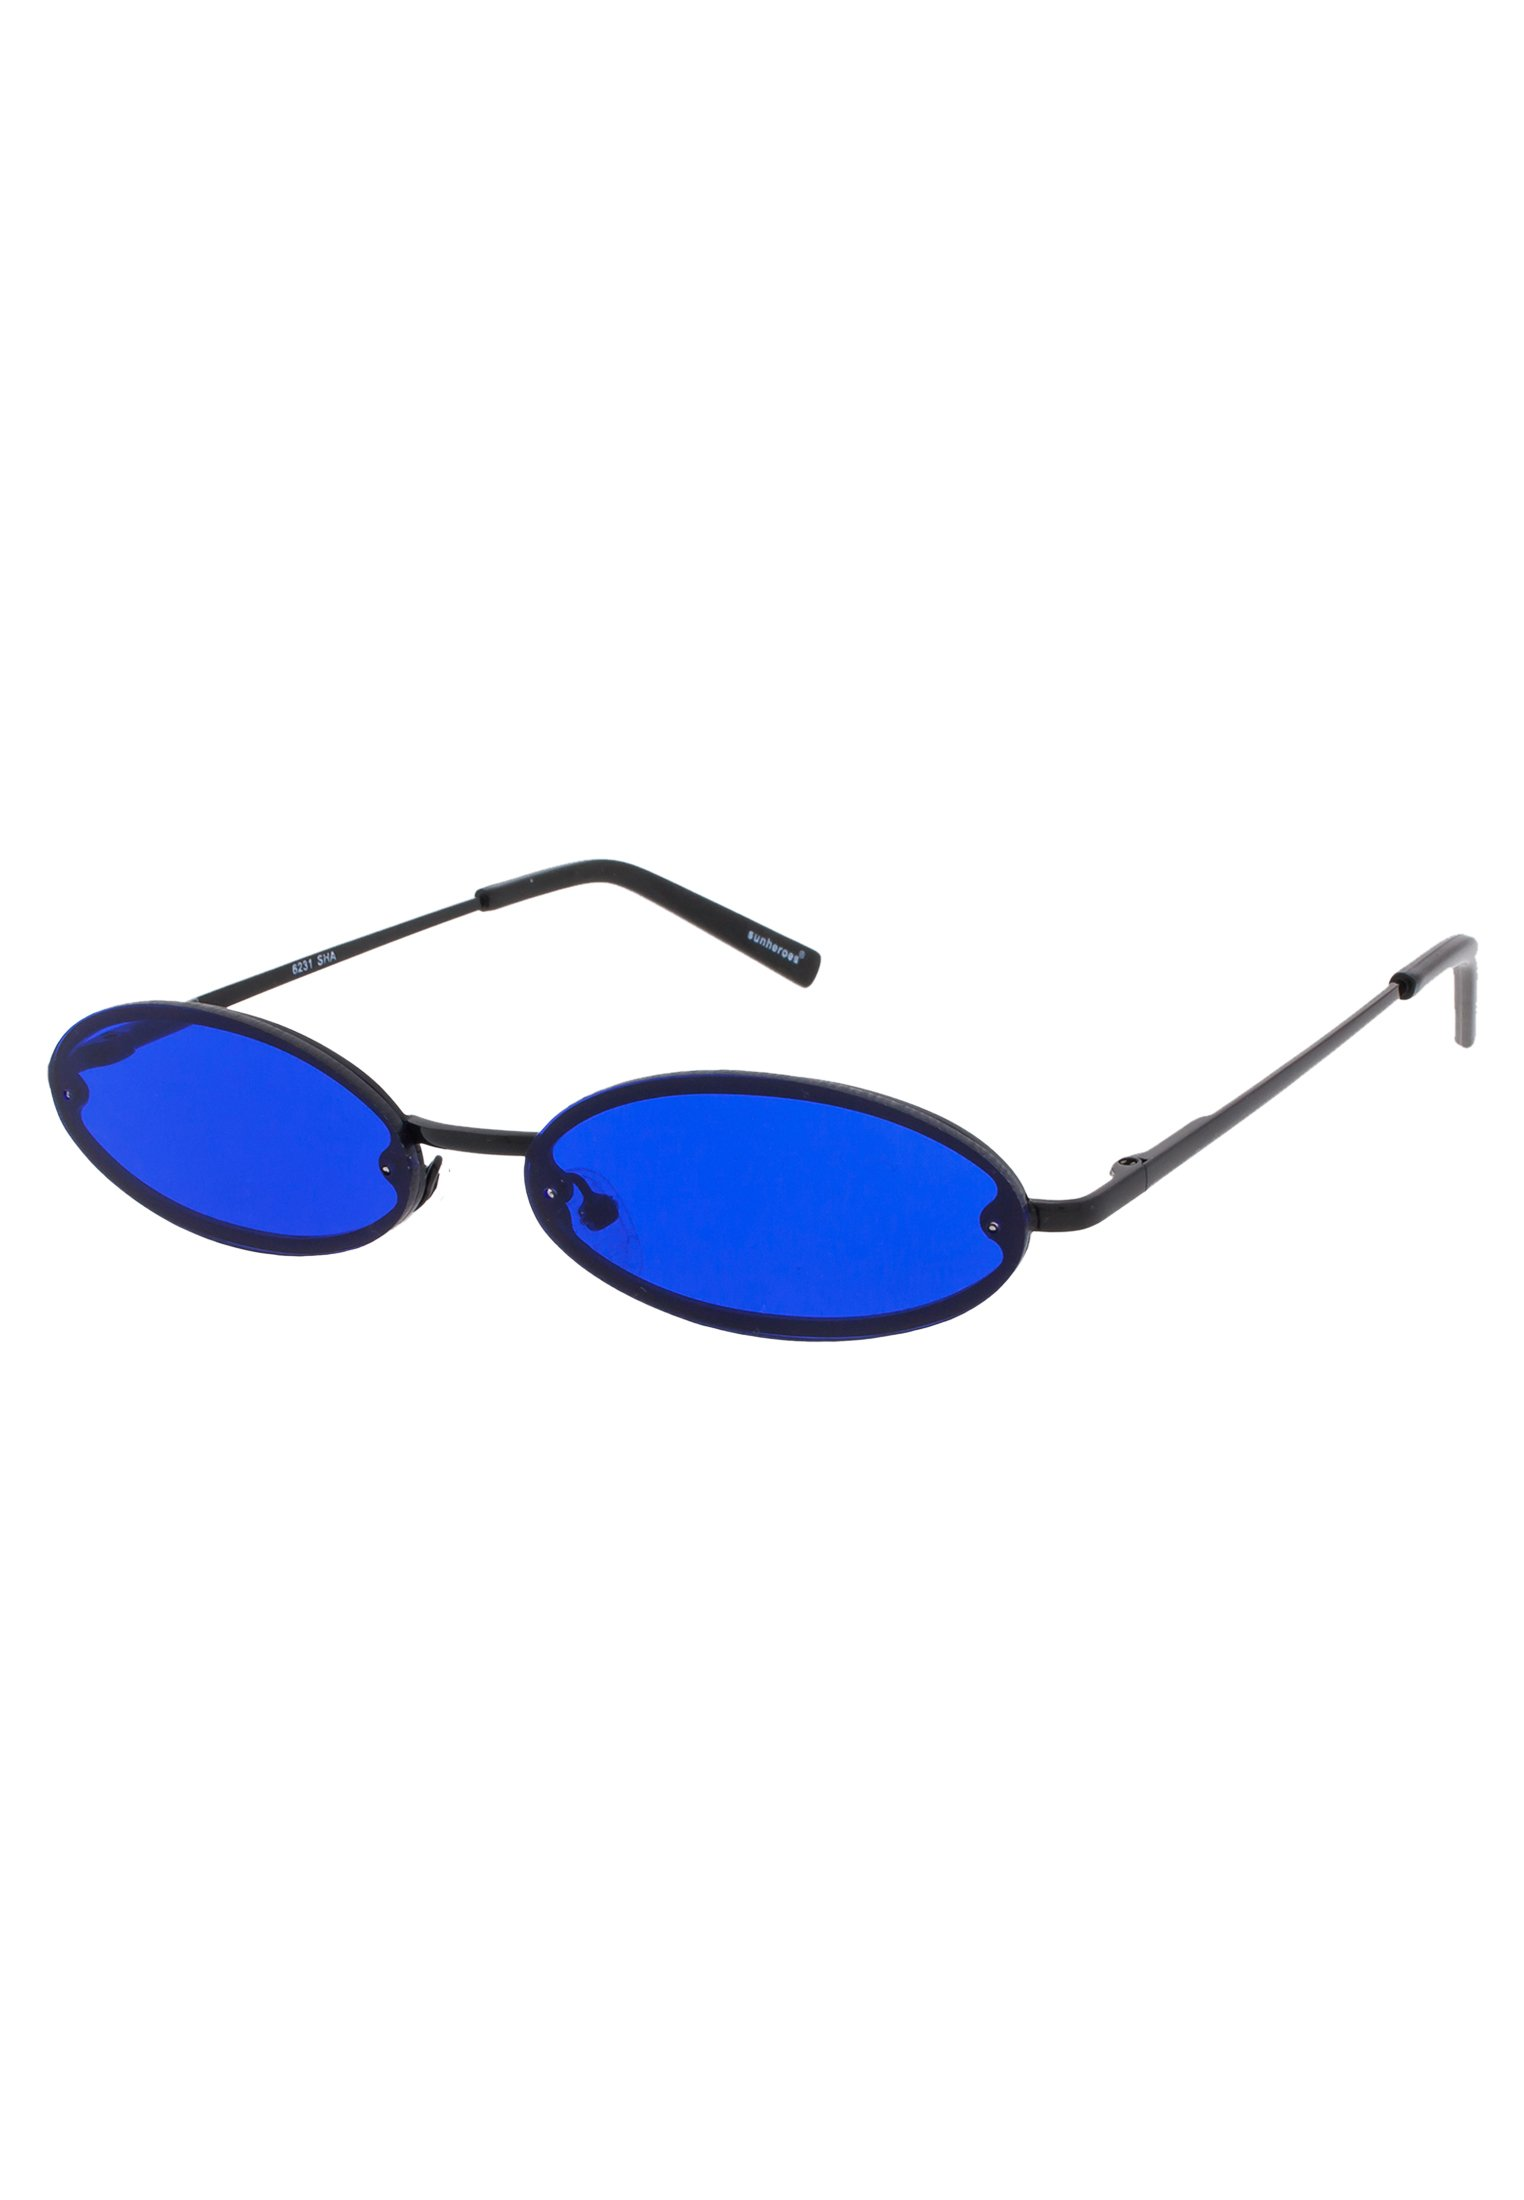 Donna 6231 - Occhiali da sole